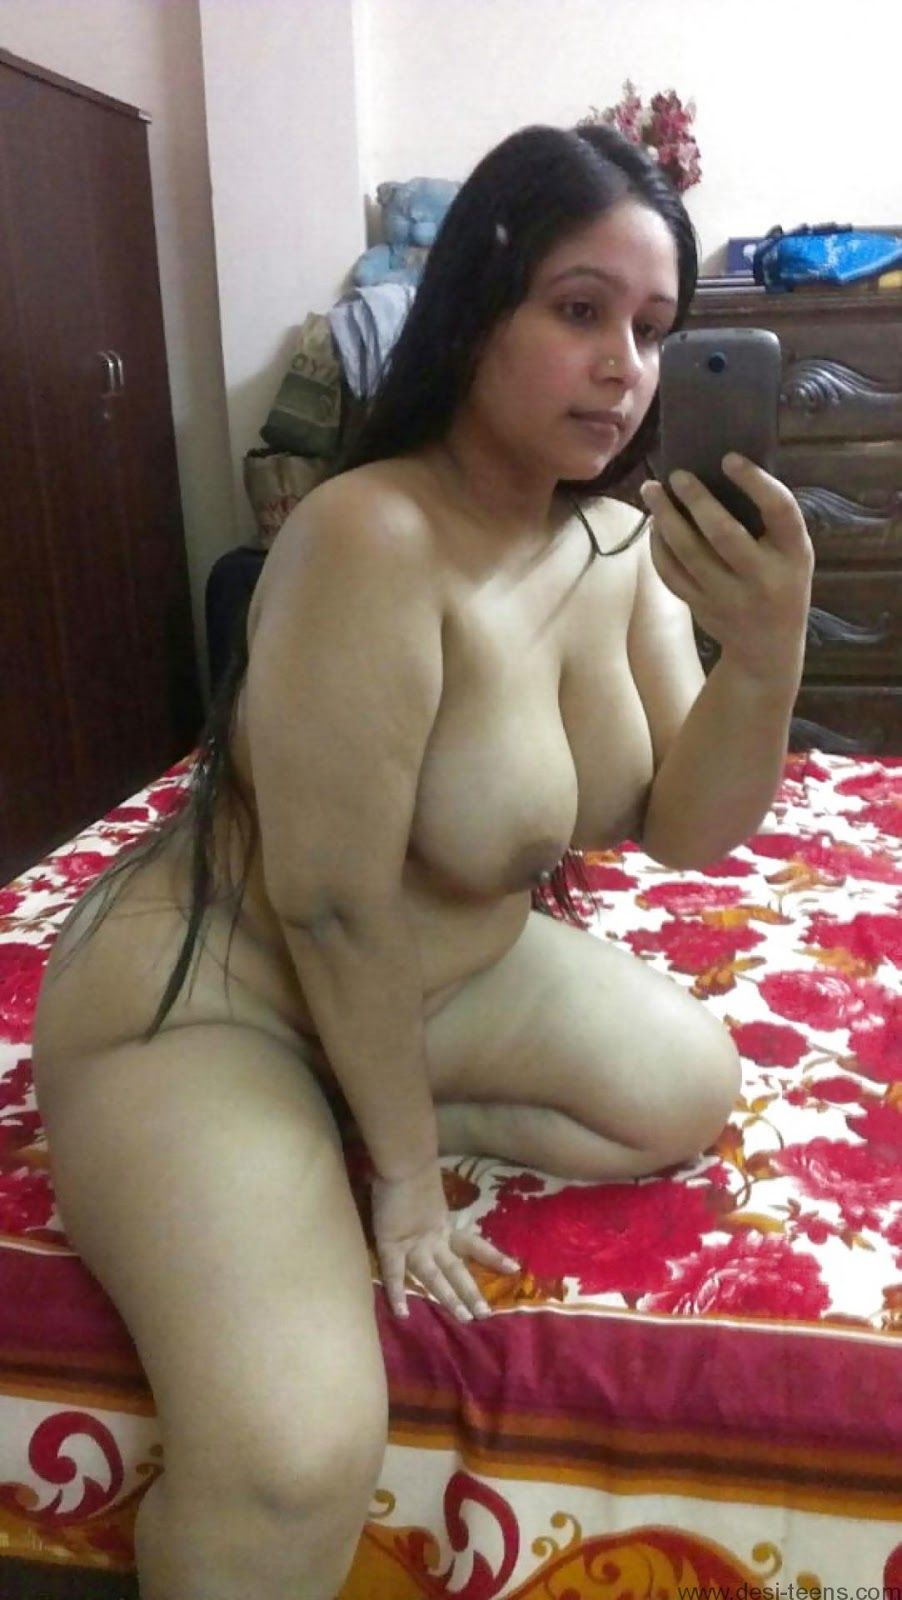 Pakistani pic sex galries sex kinky porn star